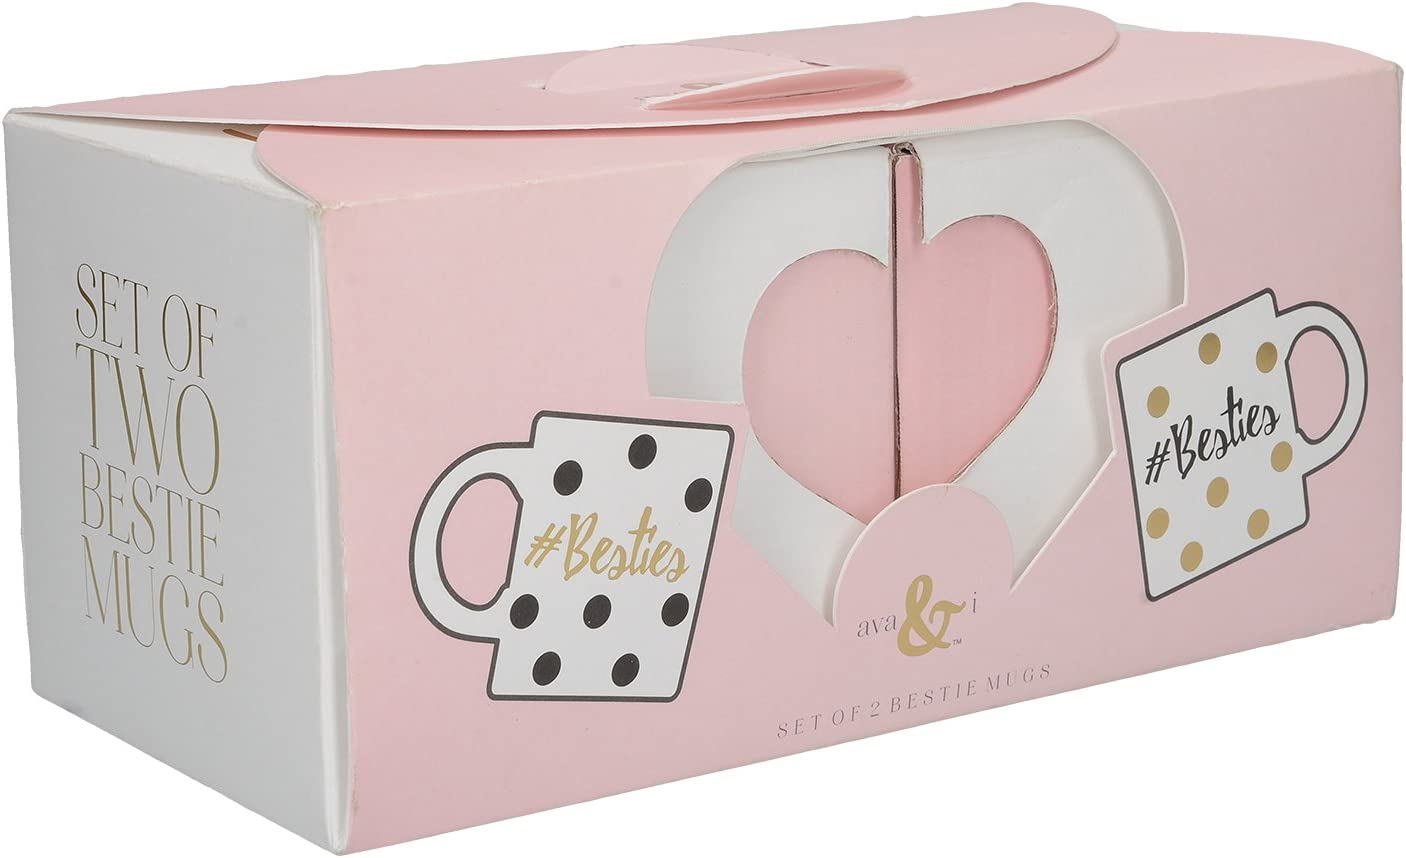 Creative Tops Ava /& I Besties Set of 2 Fine China Mugs with a Gift Box 12 fl oz. 350 ml